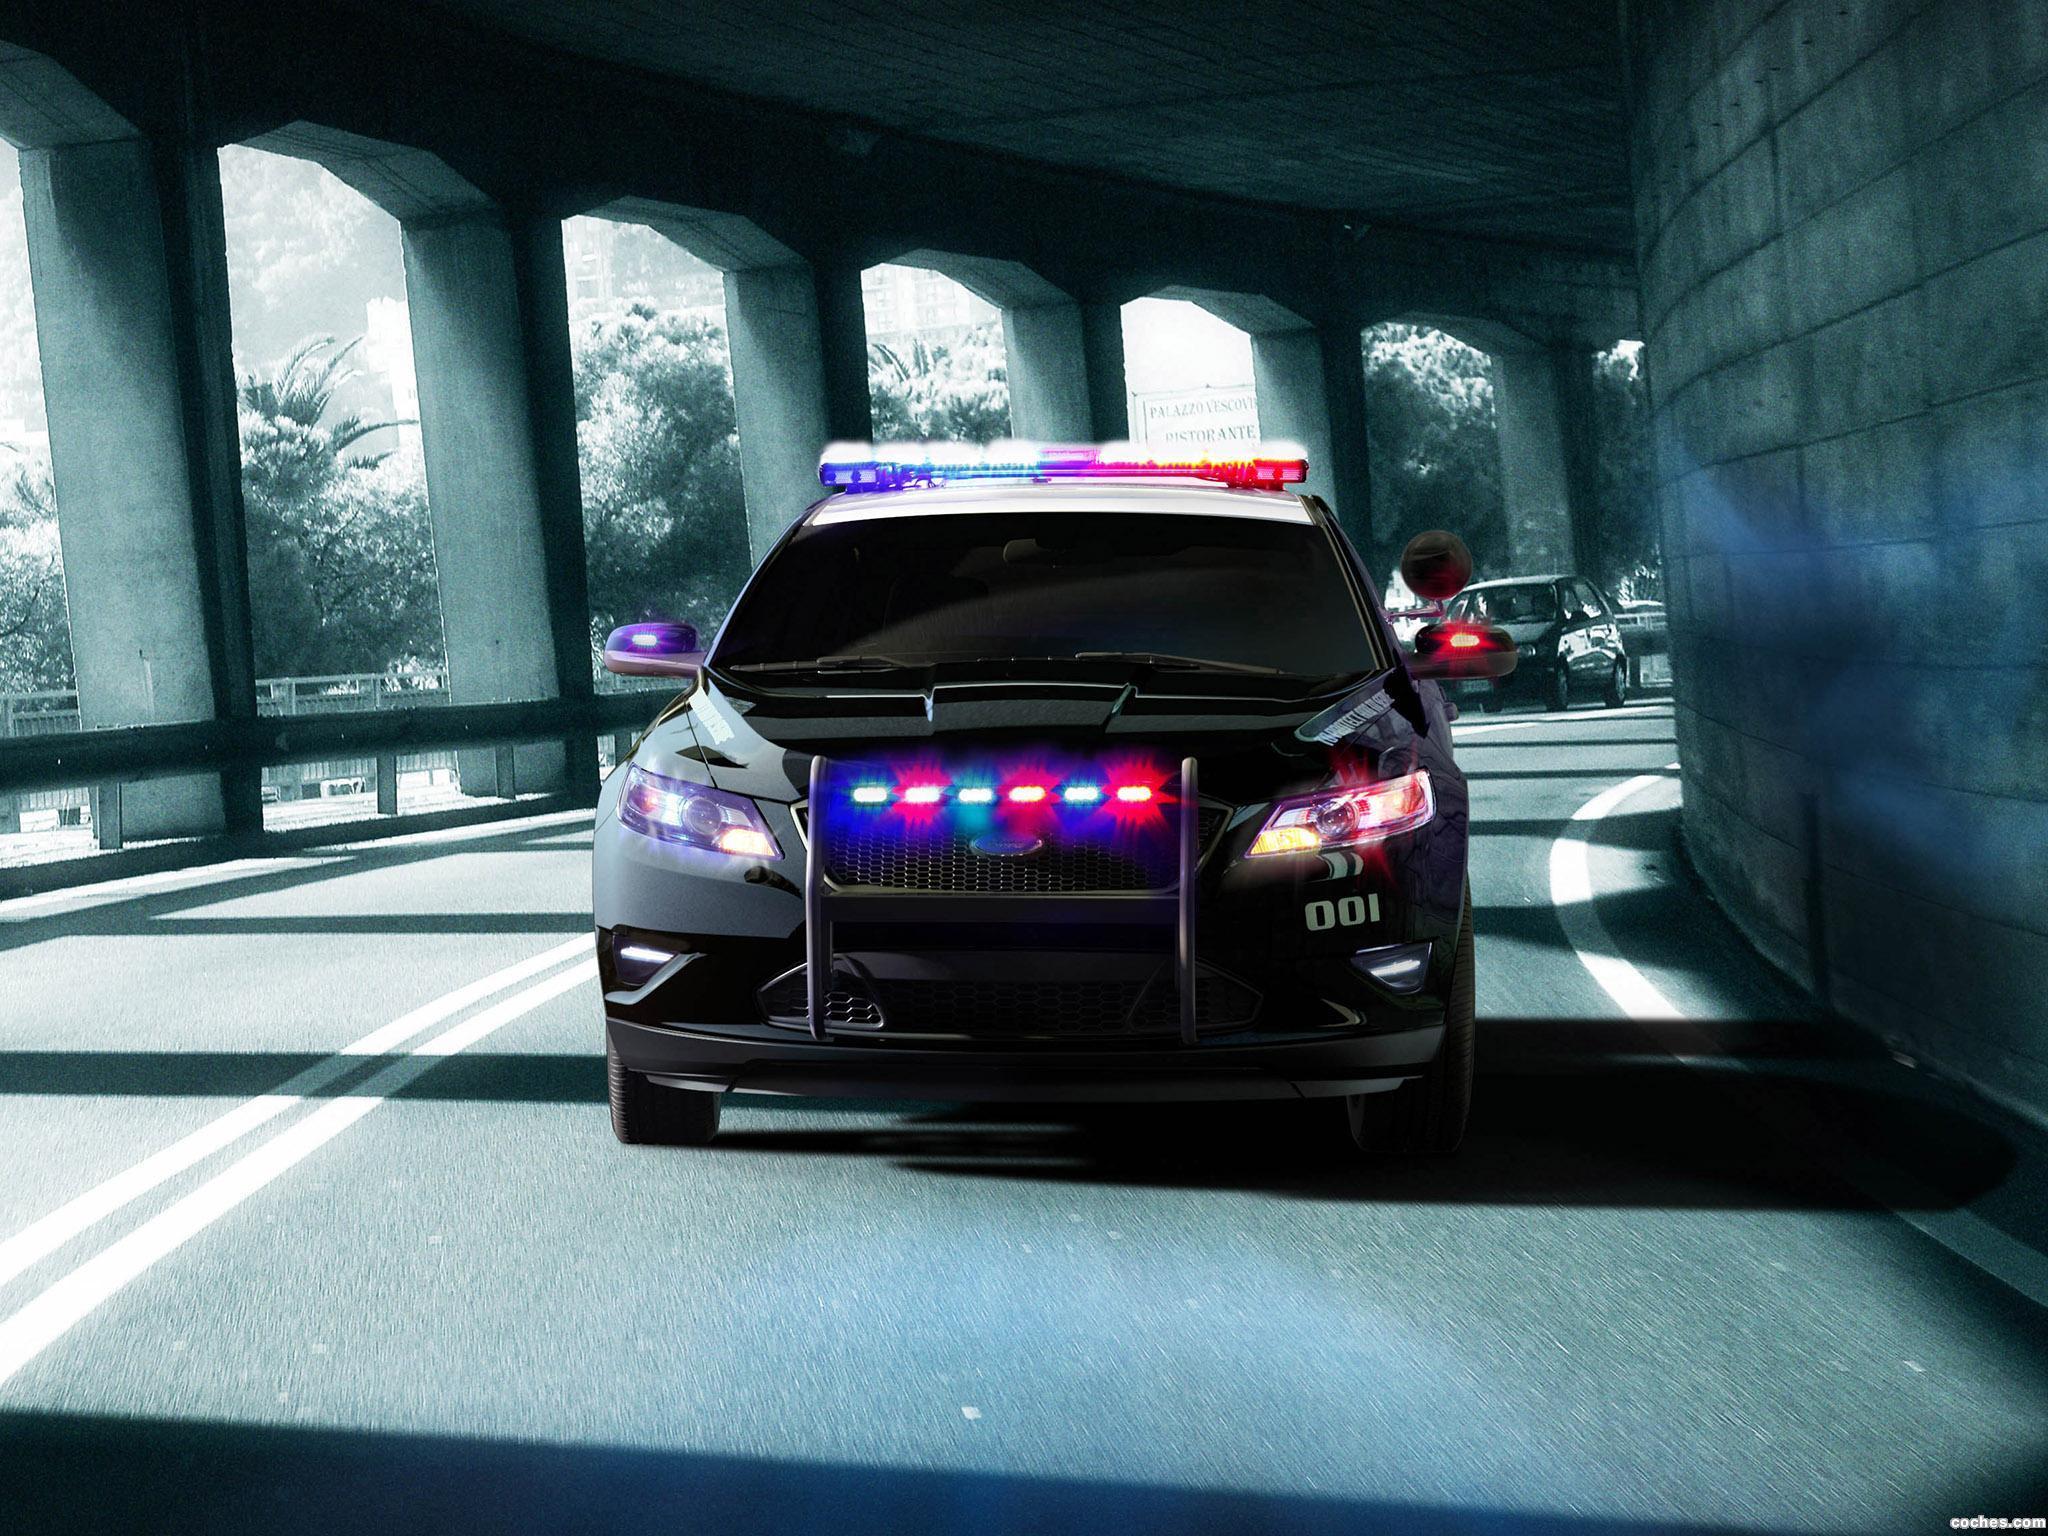 Foto 1 de Ford Interceptor Police Concept 2010